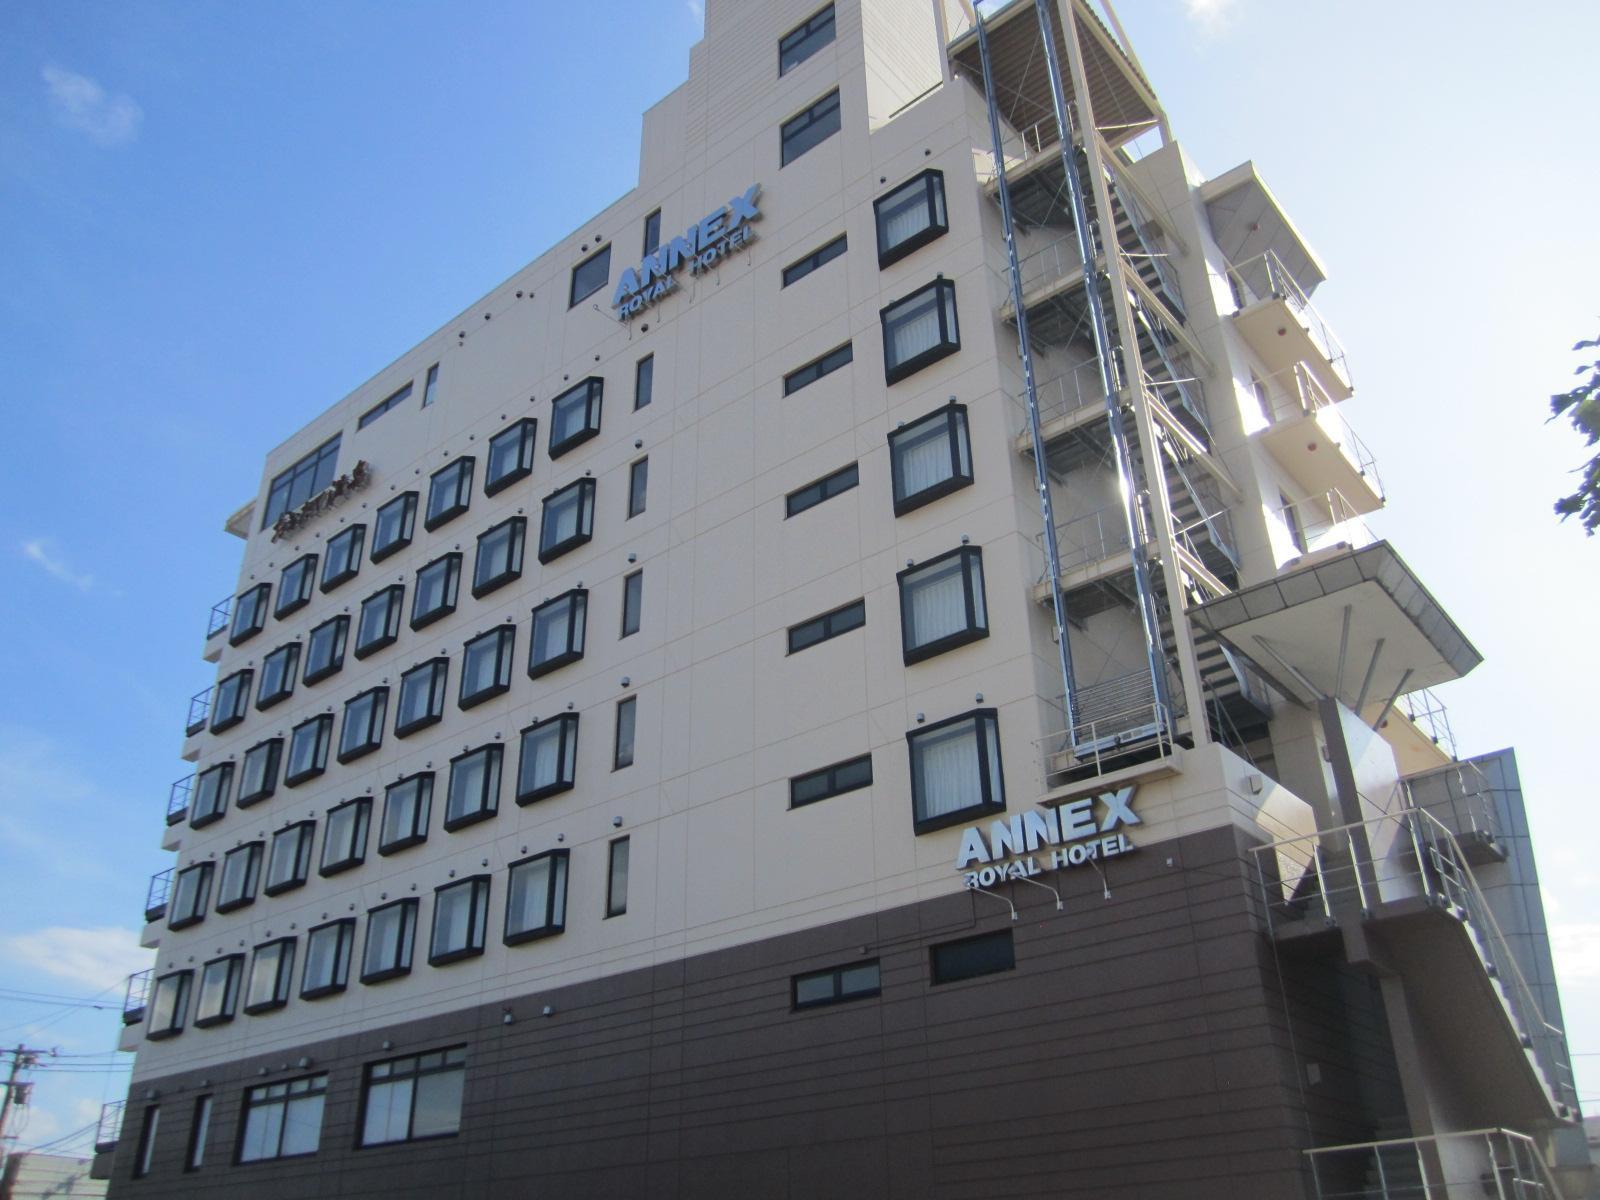 Annex Royal Hotel, Ōdate